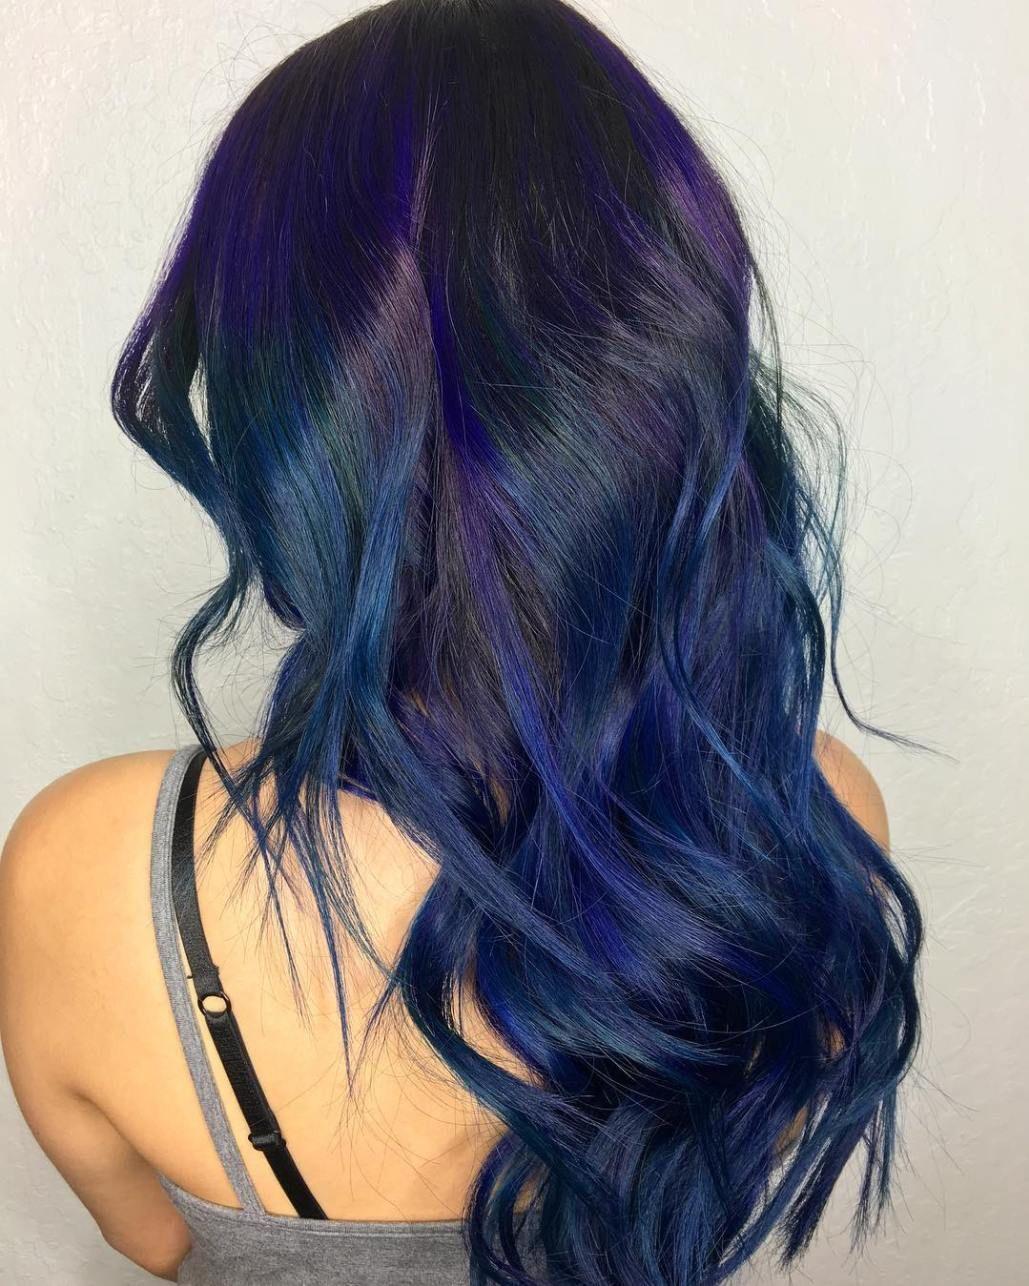 20 Dark Blue Hairstyles That Will Brighten Up Your Look Make Up